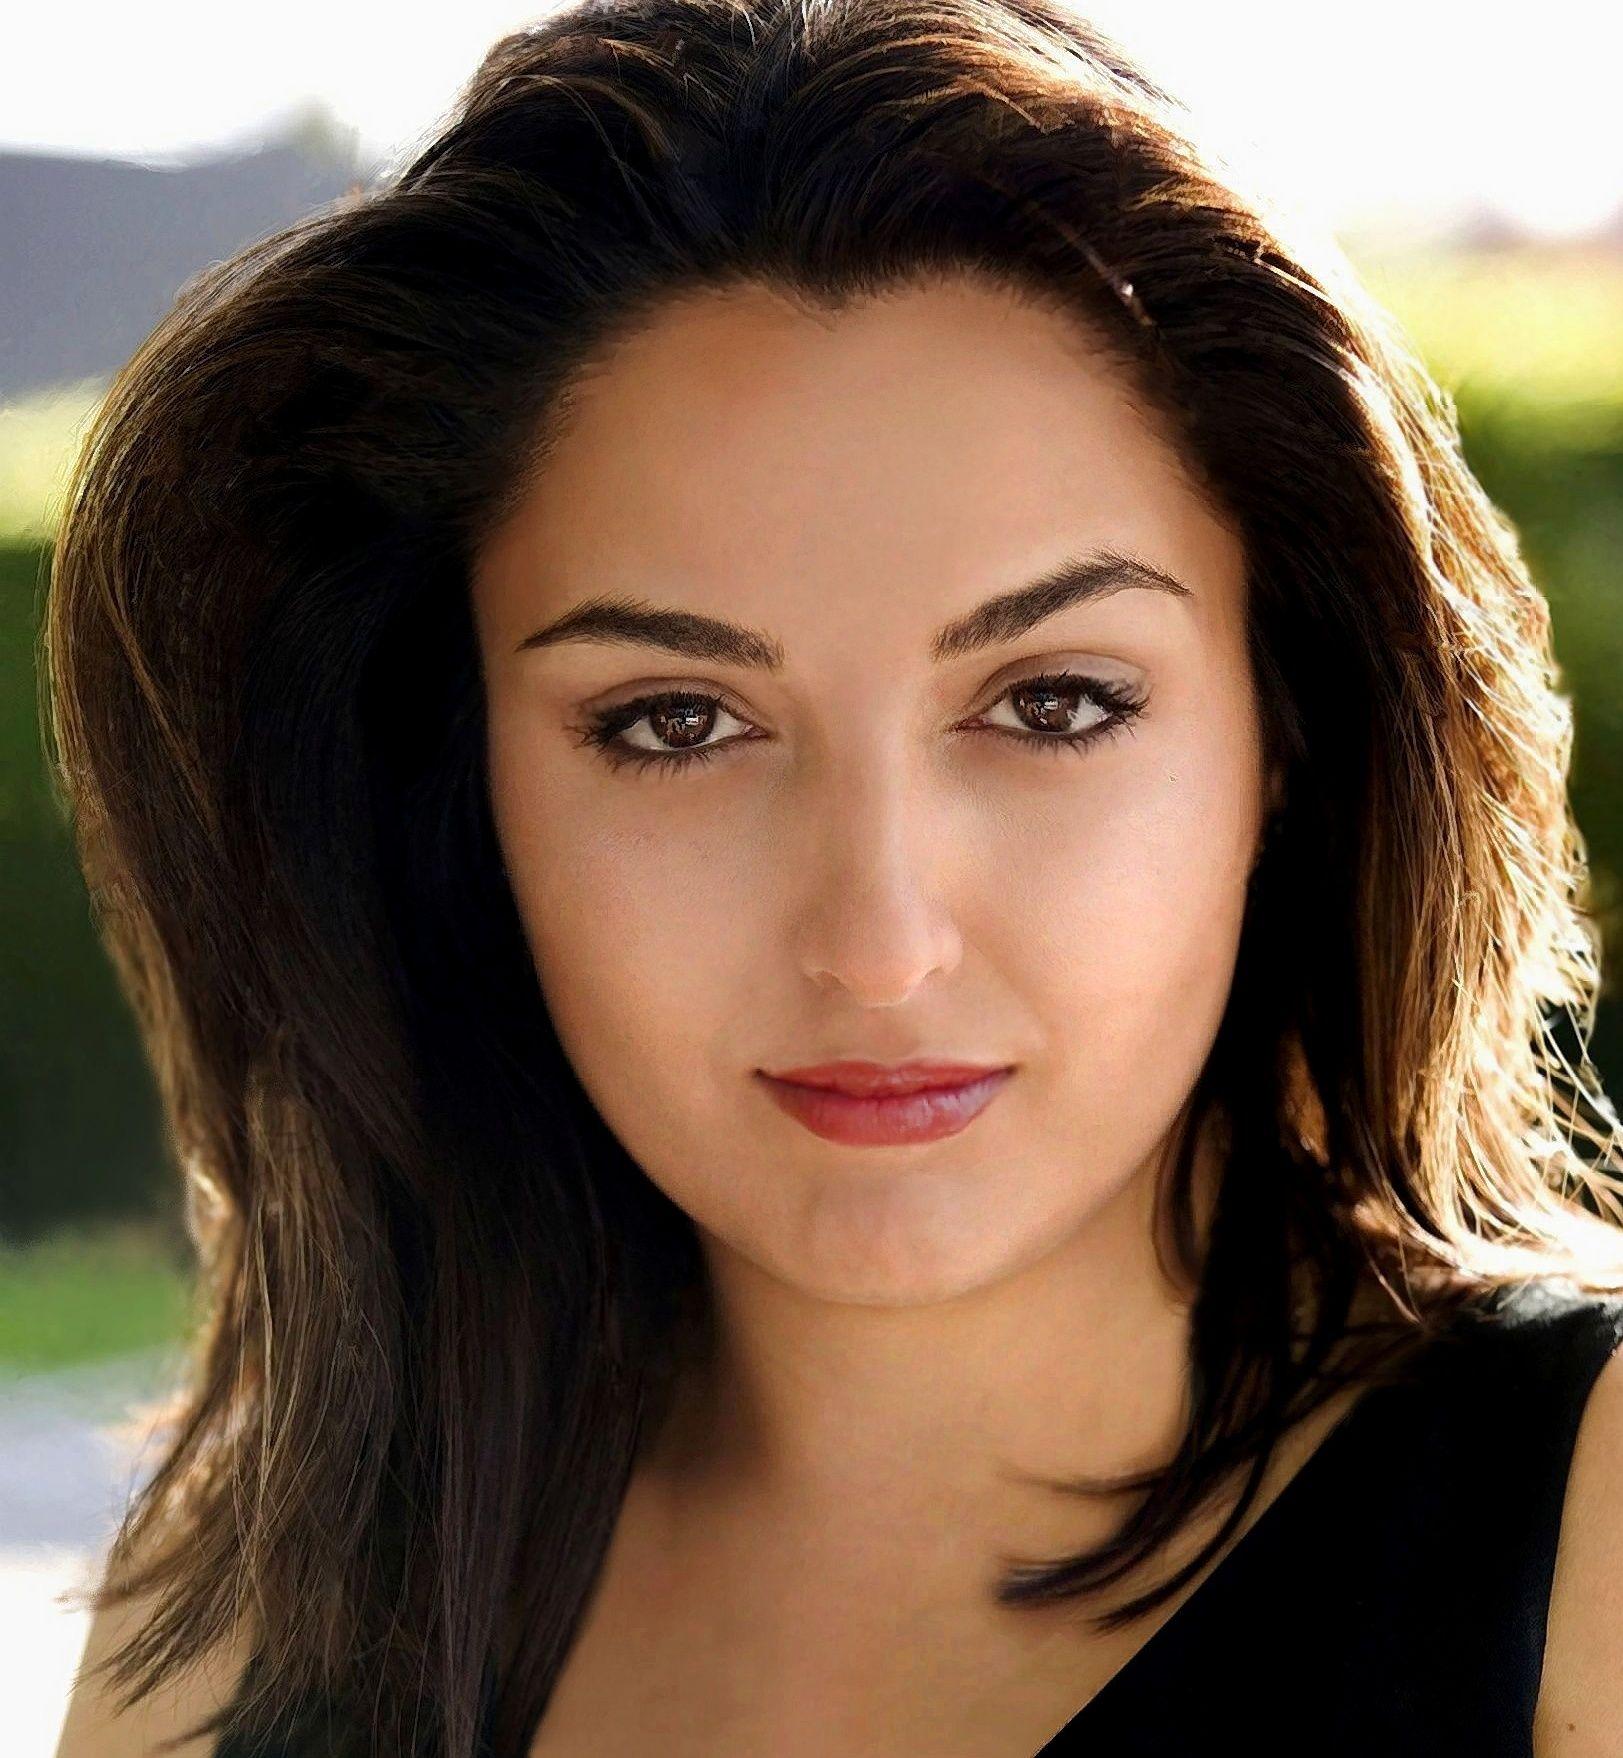 Nicole Kian Sadighi - Pix 4